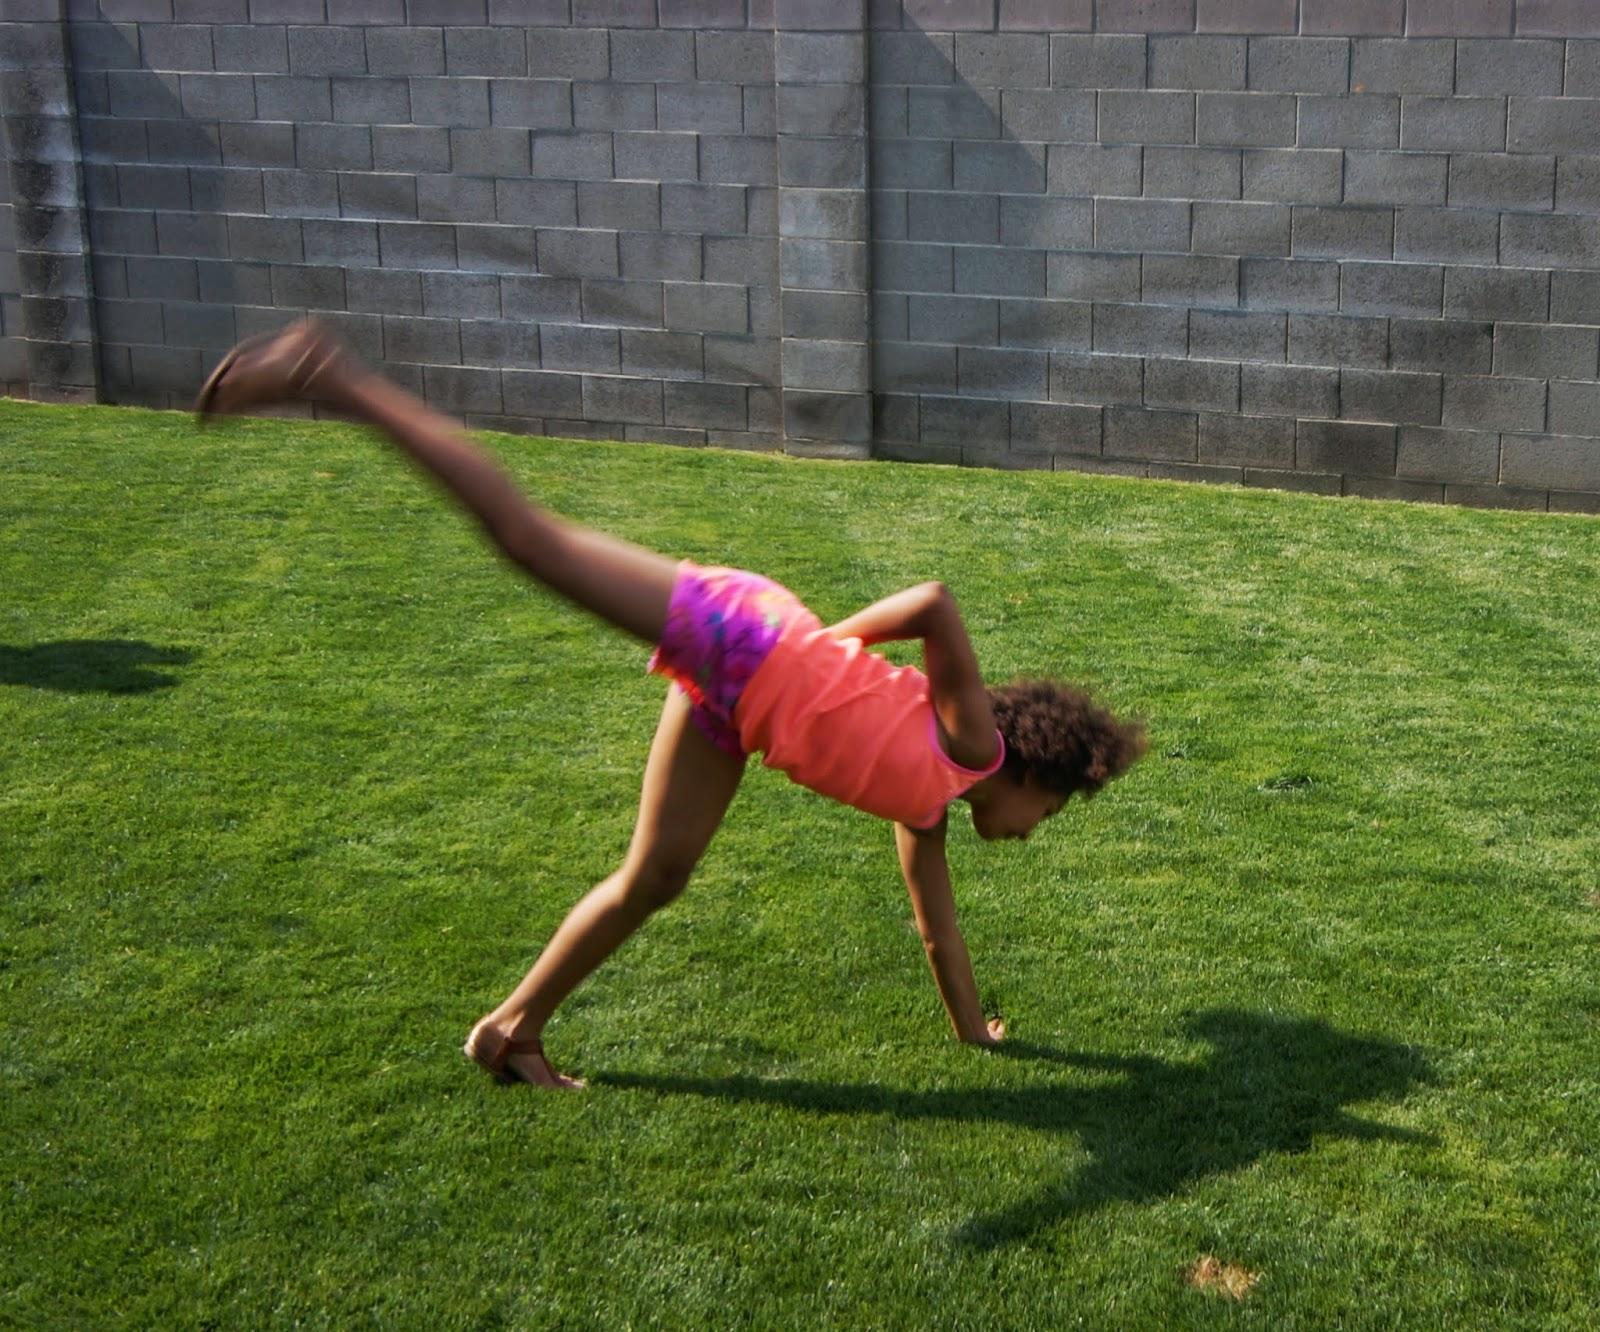 photos A6000: backyard gymnastics